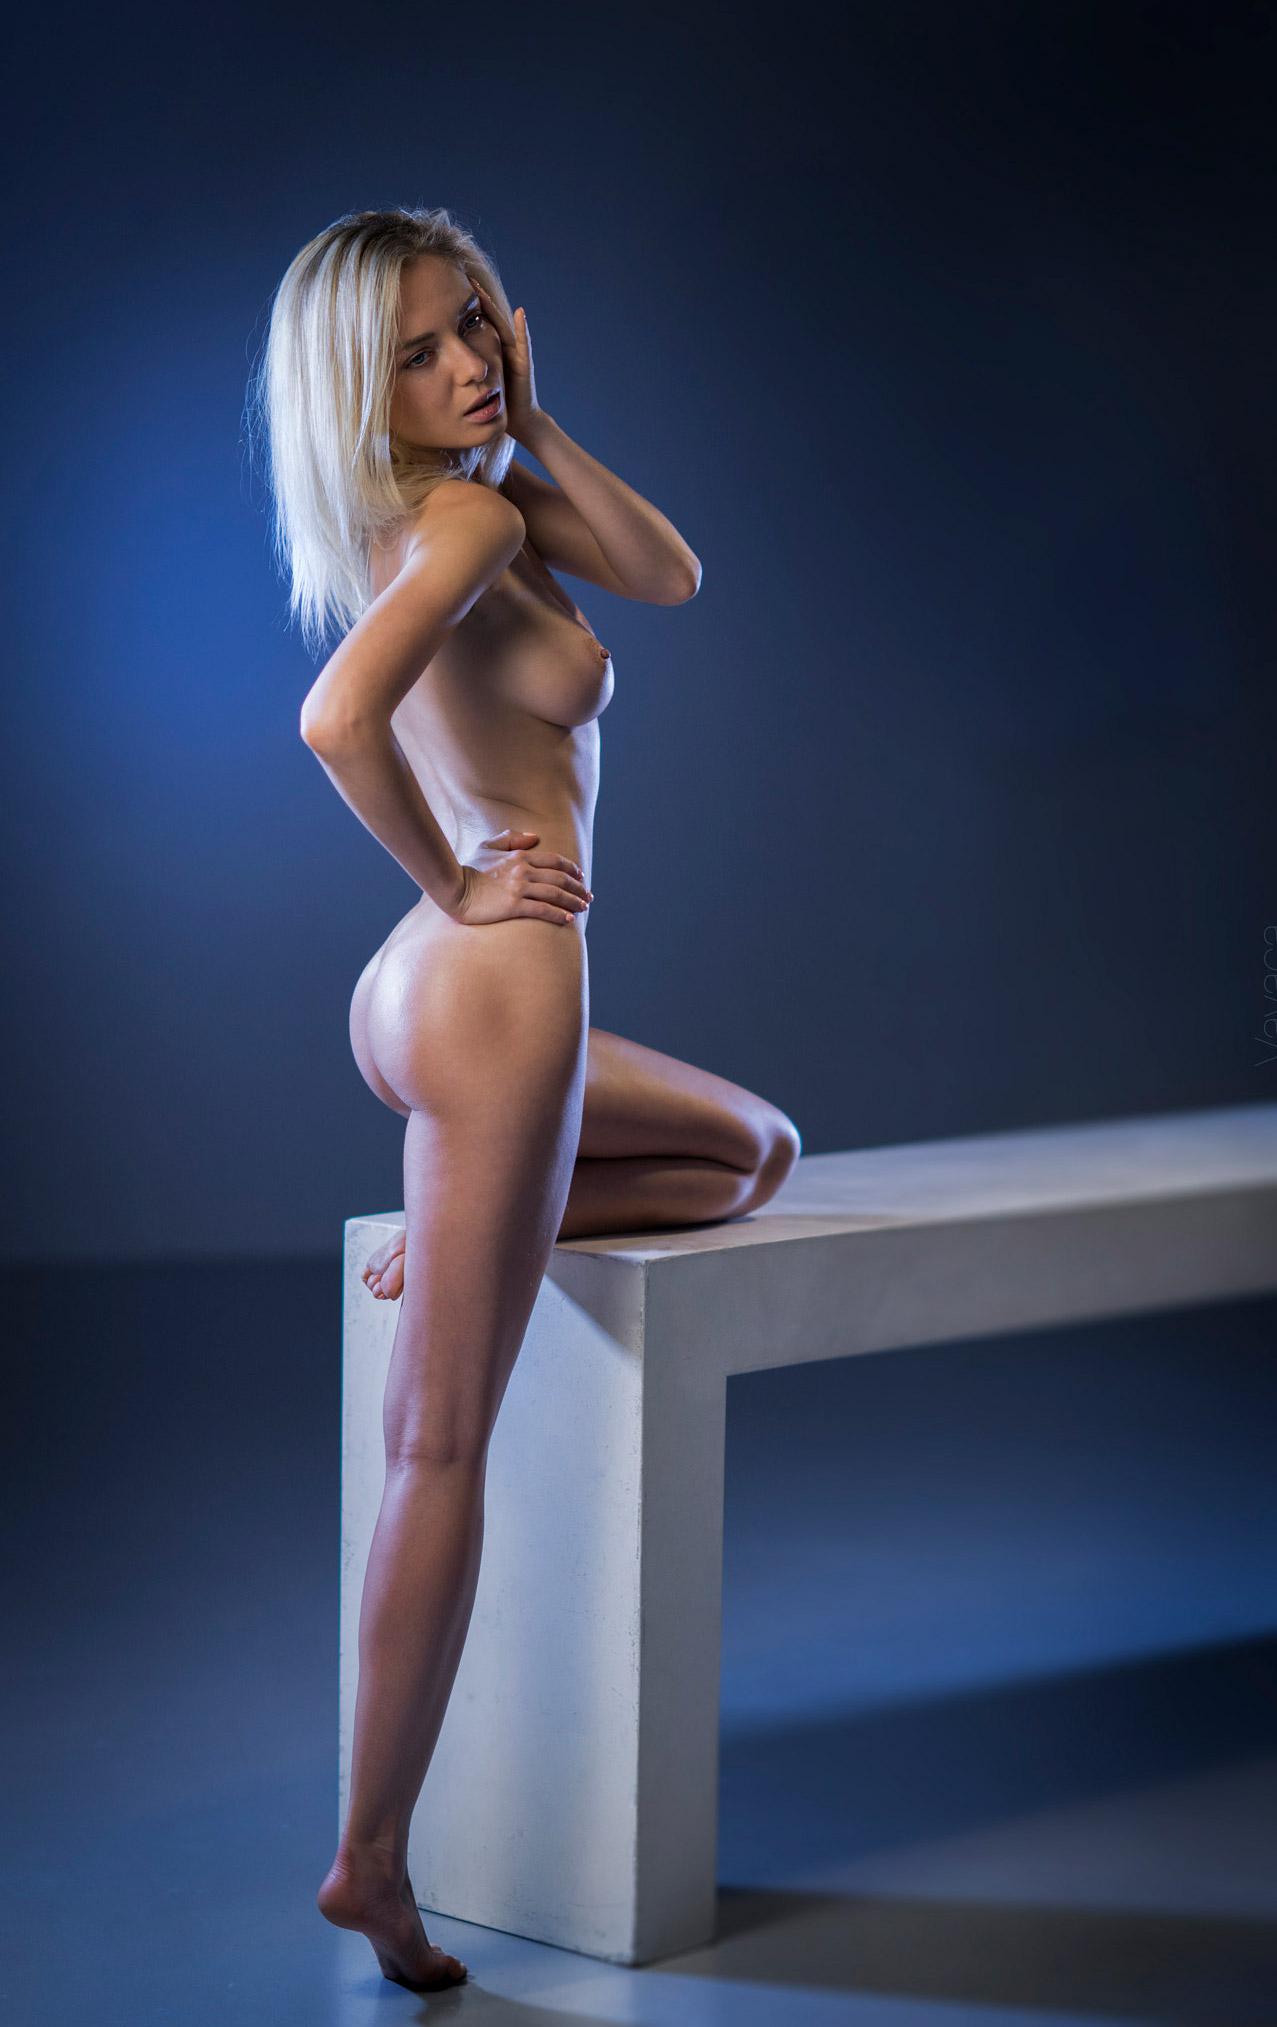 Наталья Андреева / Natalia Andreeva nude by Vladimir Nikolaev